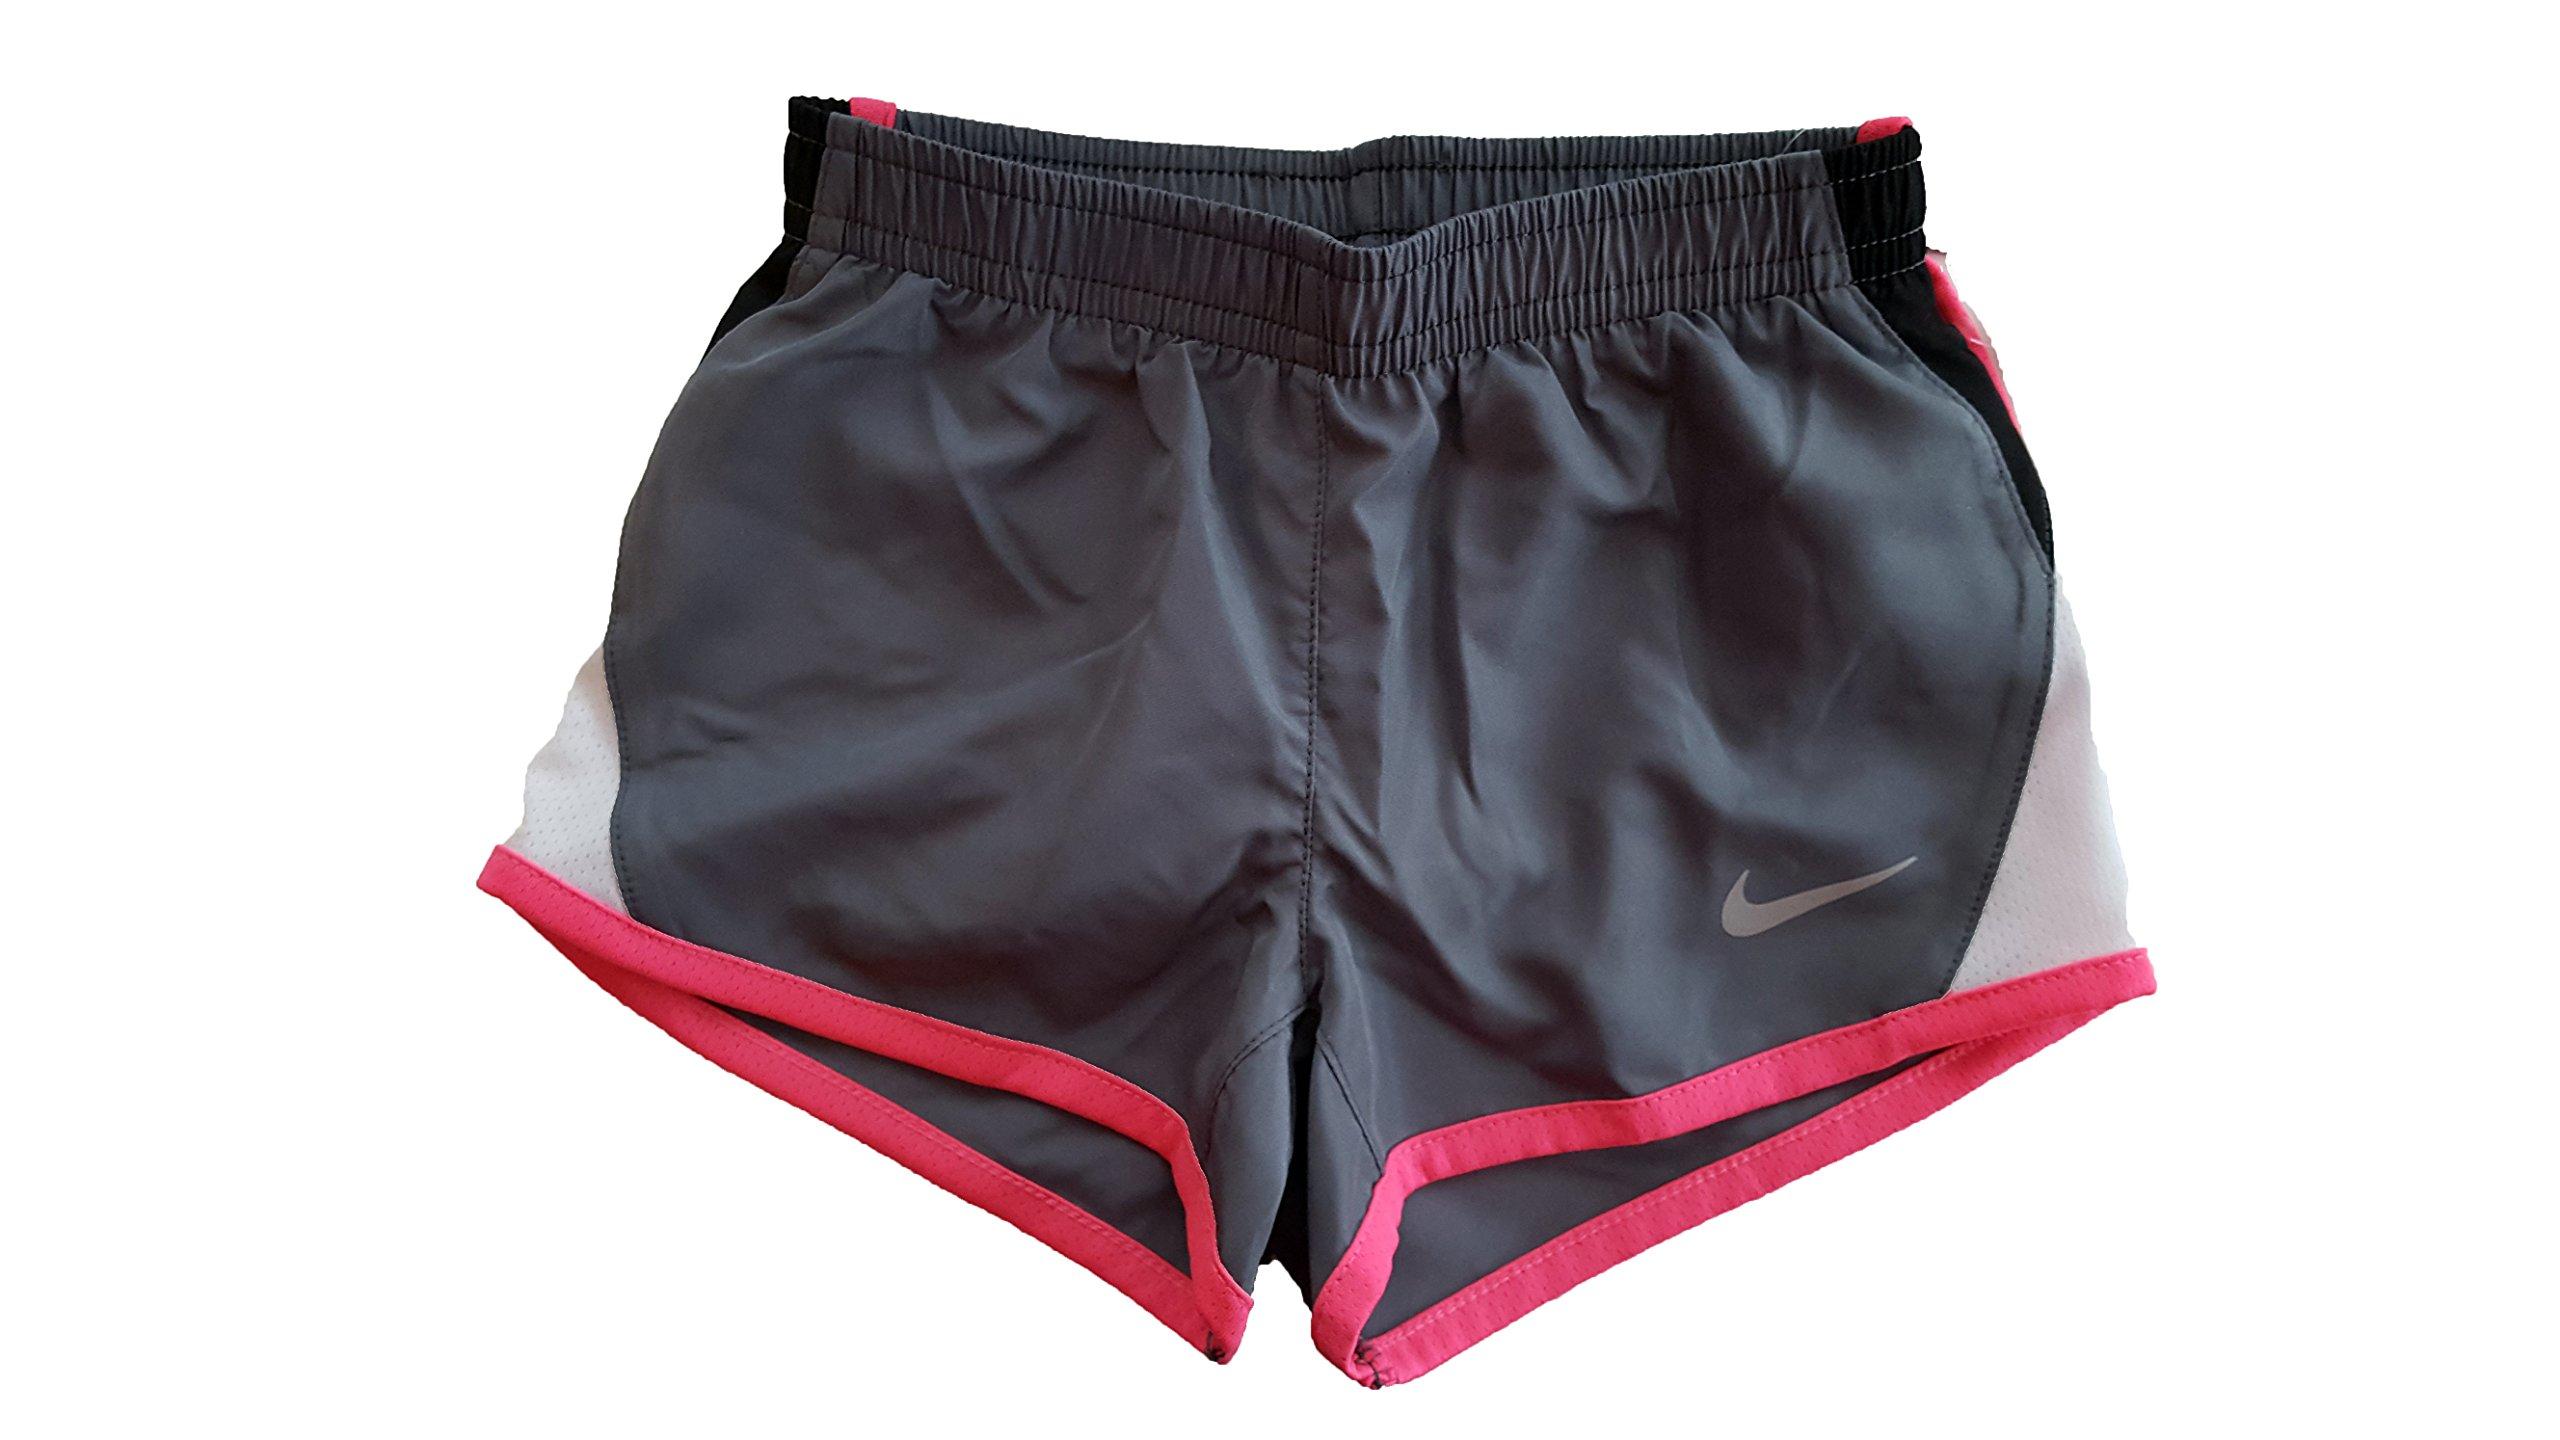 Nike Little Girls' Tempo Shorts (2T, Cool Grey (478) / Black/White/Pink)